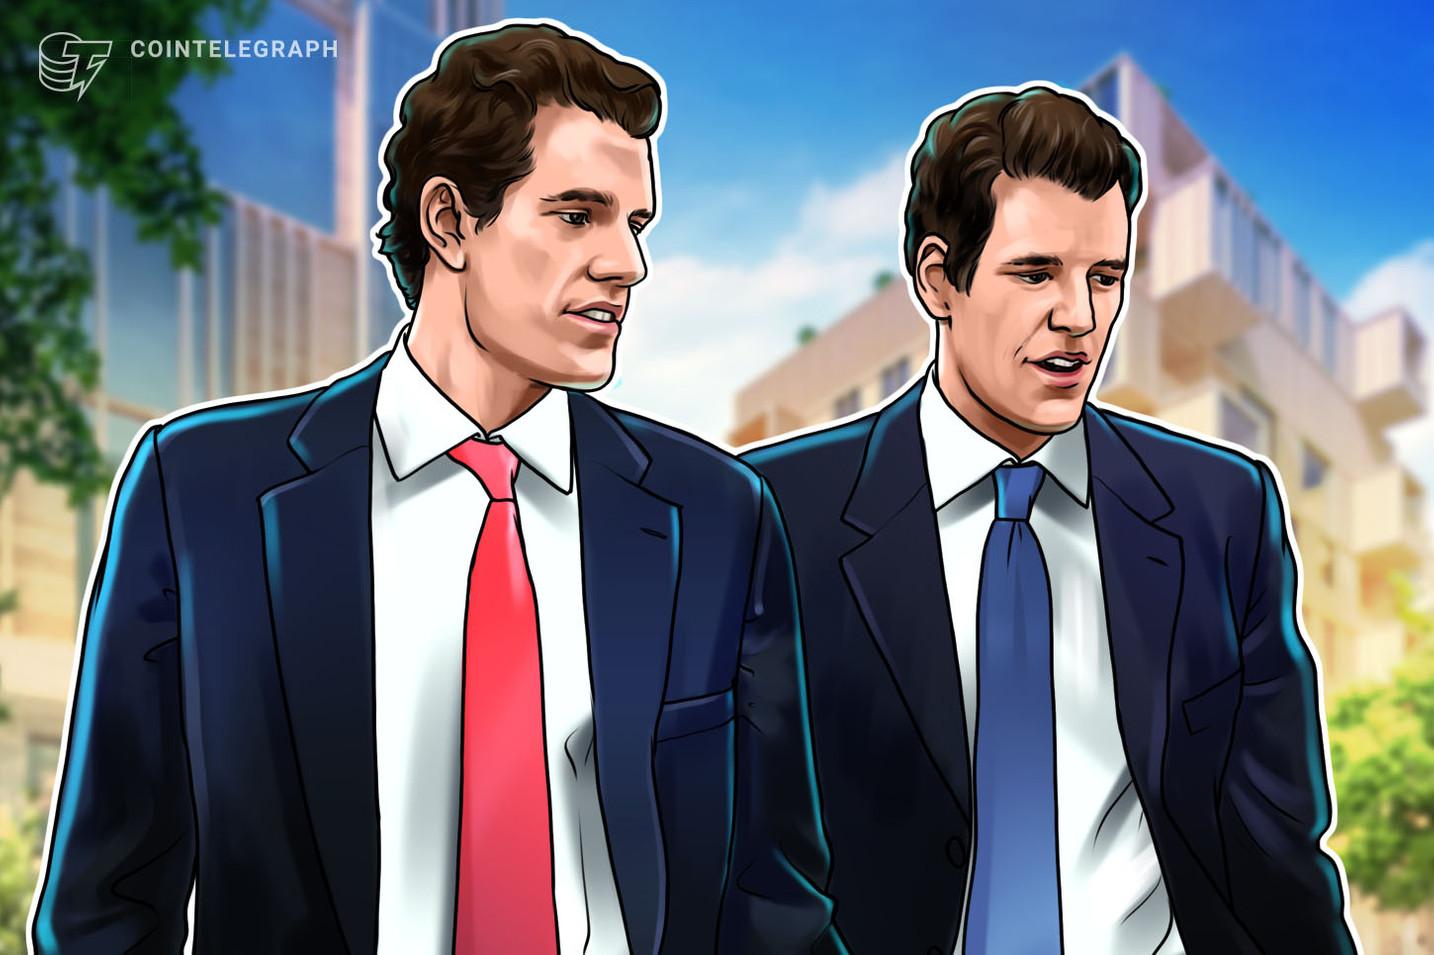 Bitcoin's market cap will flip gold: Winklevoss twins